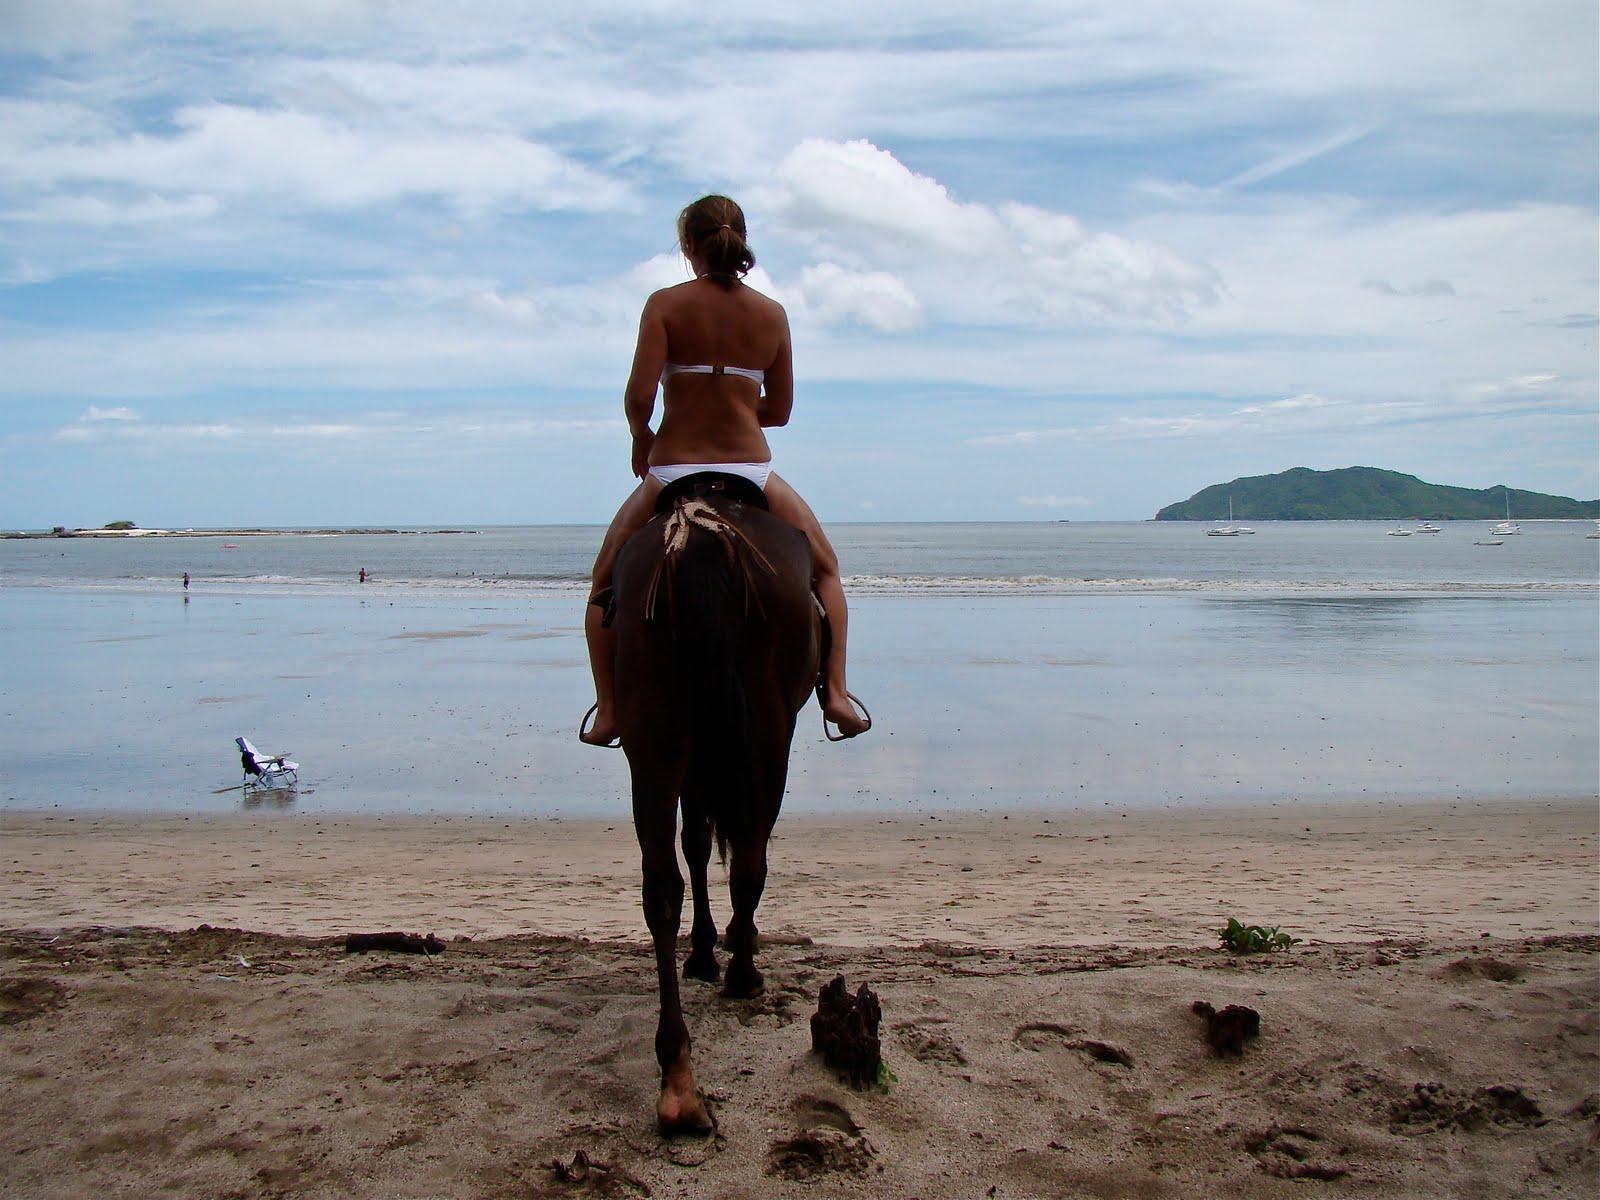 Rider Daily Horseback Rica PhotoBikini TamarindoCosta uTK1cFlJ3